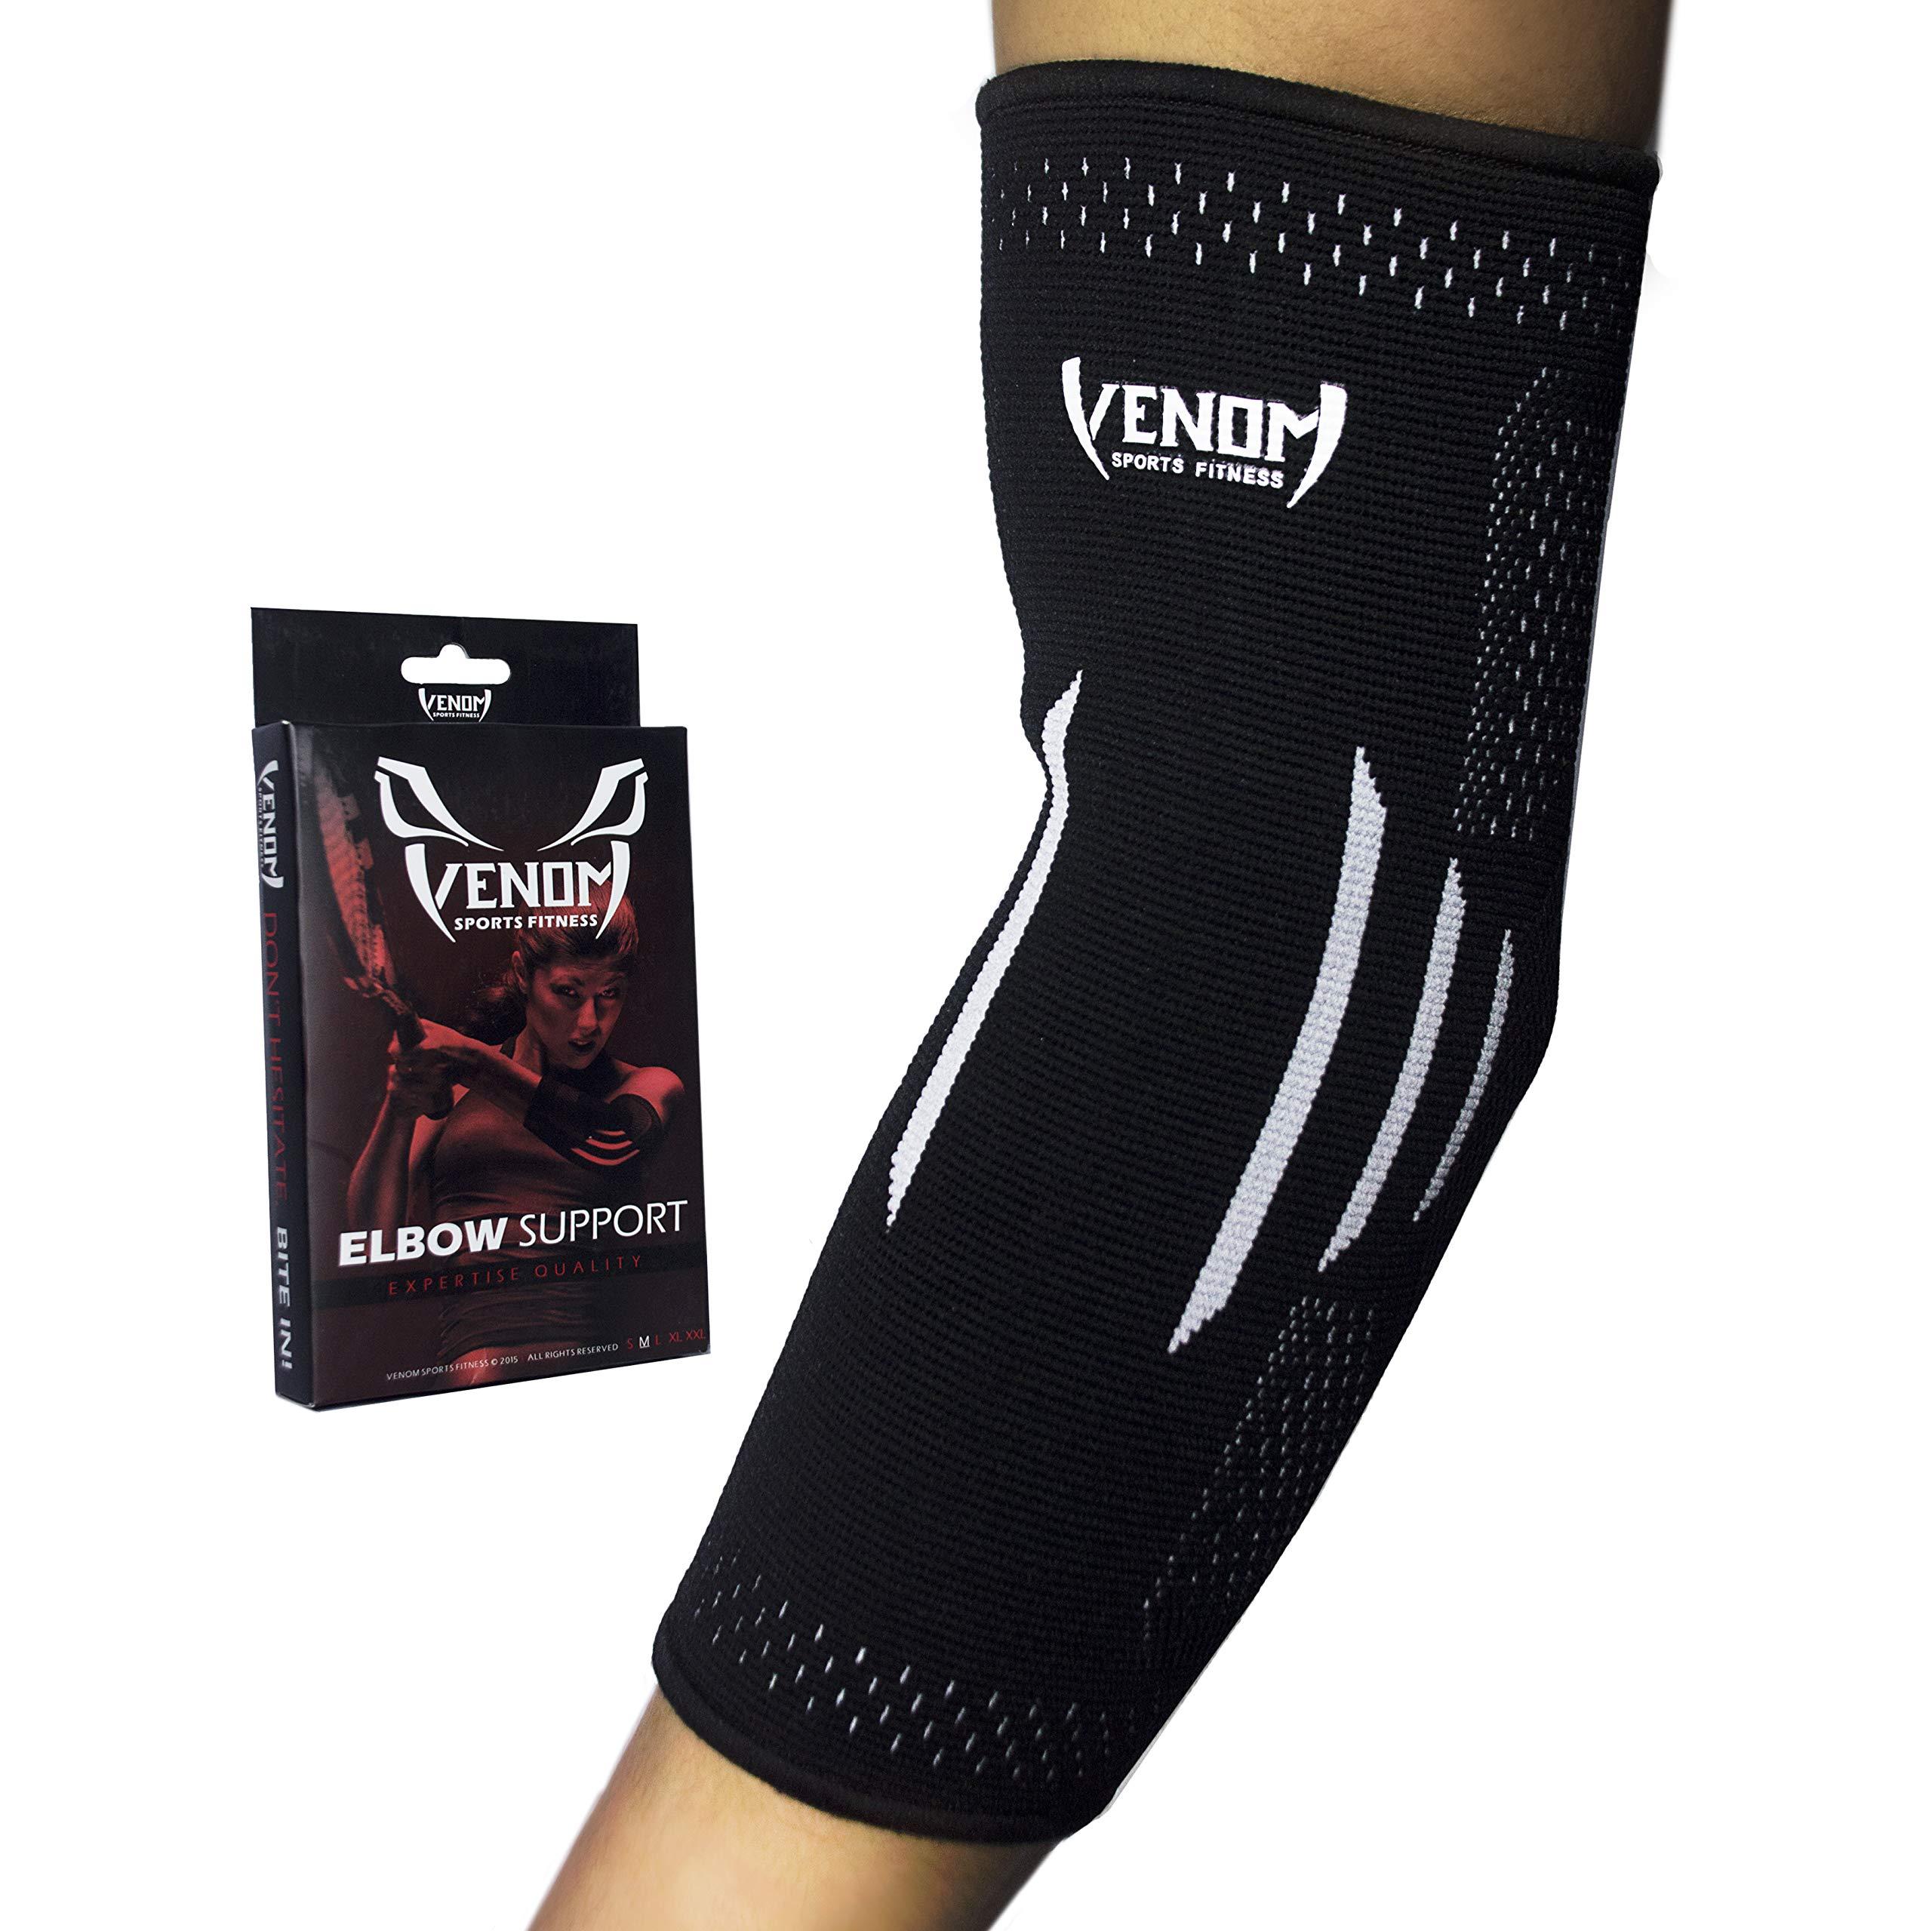 f946554ced1975 Venom Elbow Brace Compression Sleeve - Elastic Support, Tendonitis Pain,  Tennis Elbow, Golfer's